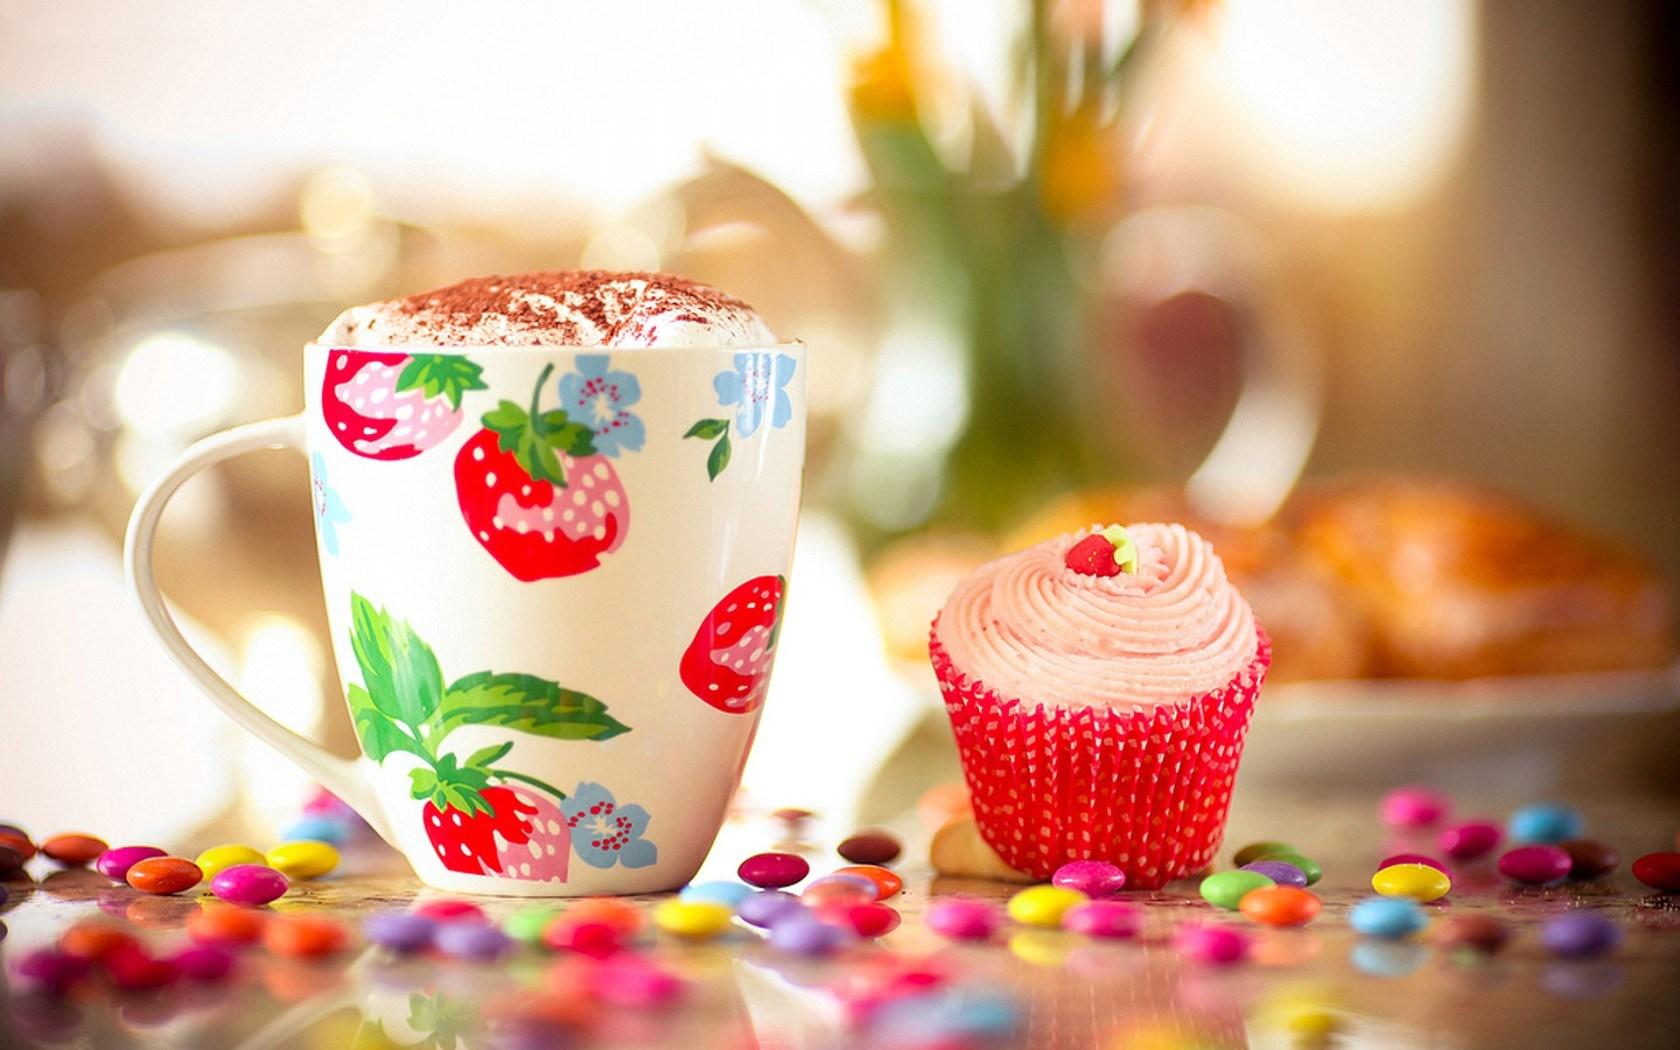 Mug Drink Foam Cake Candy Jelly Beans Food